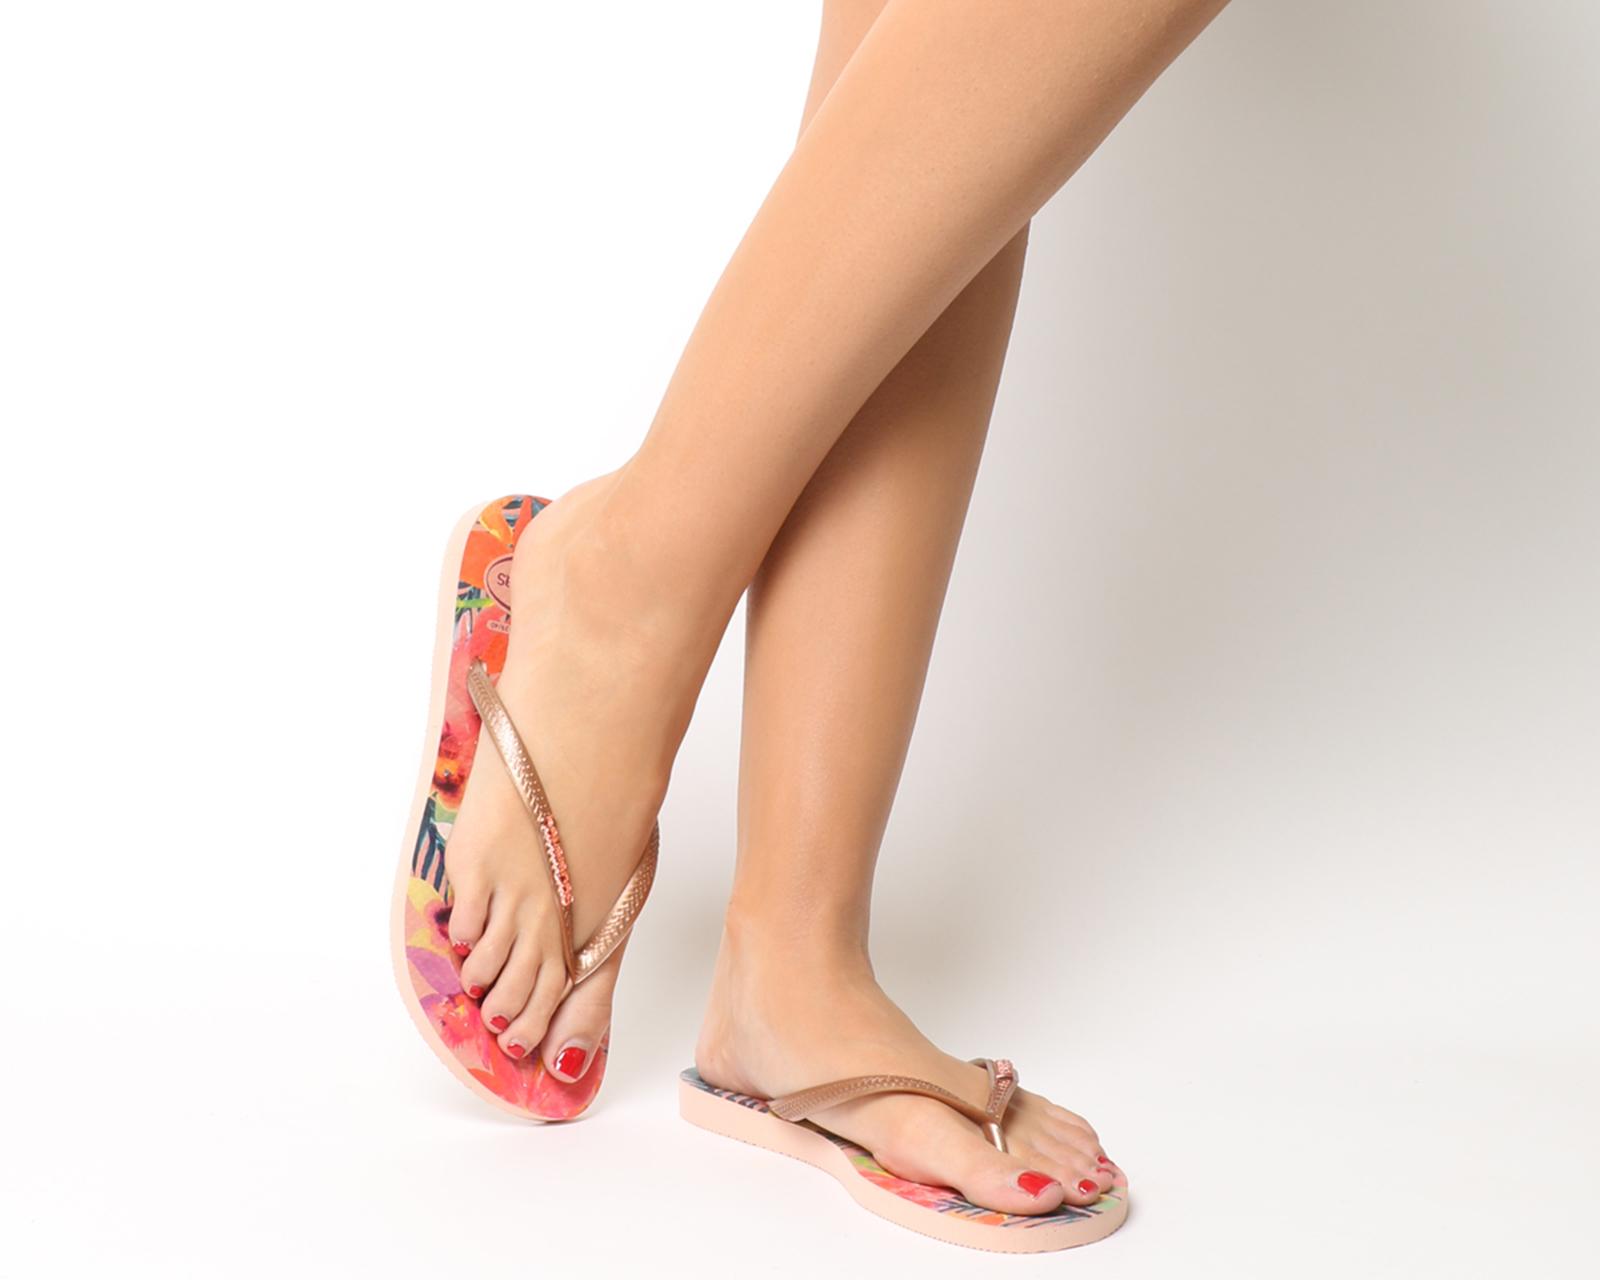 f06858c416326 Sentinel Womens Havaianas Slim Tropical Flip Flops Ballet Rose Sandals